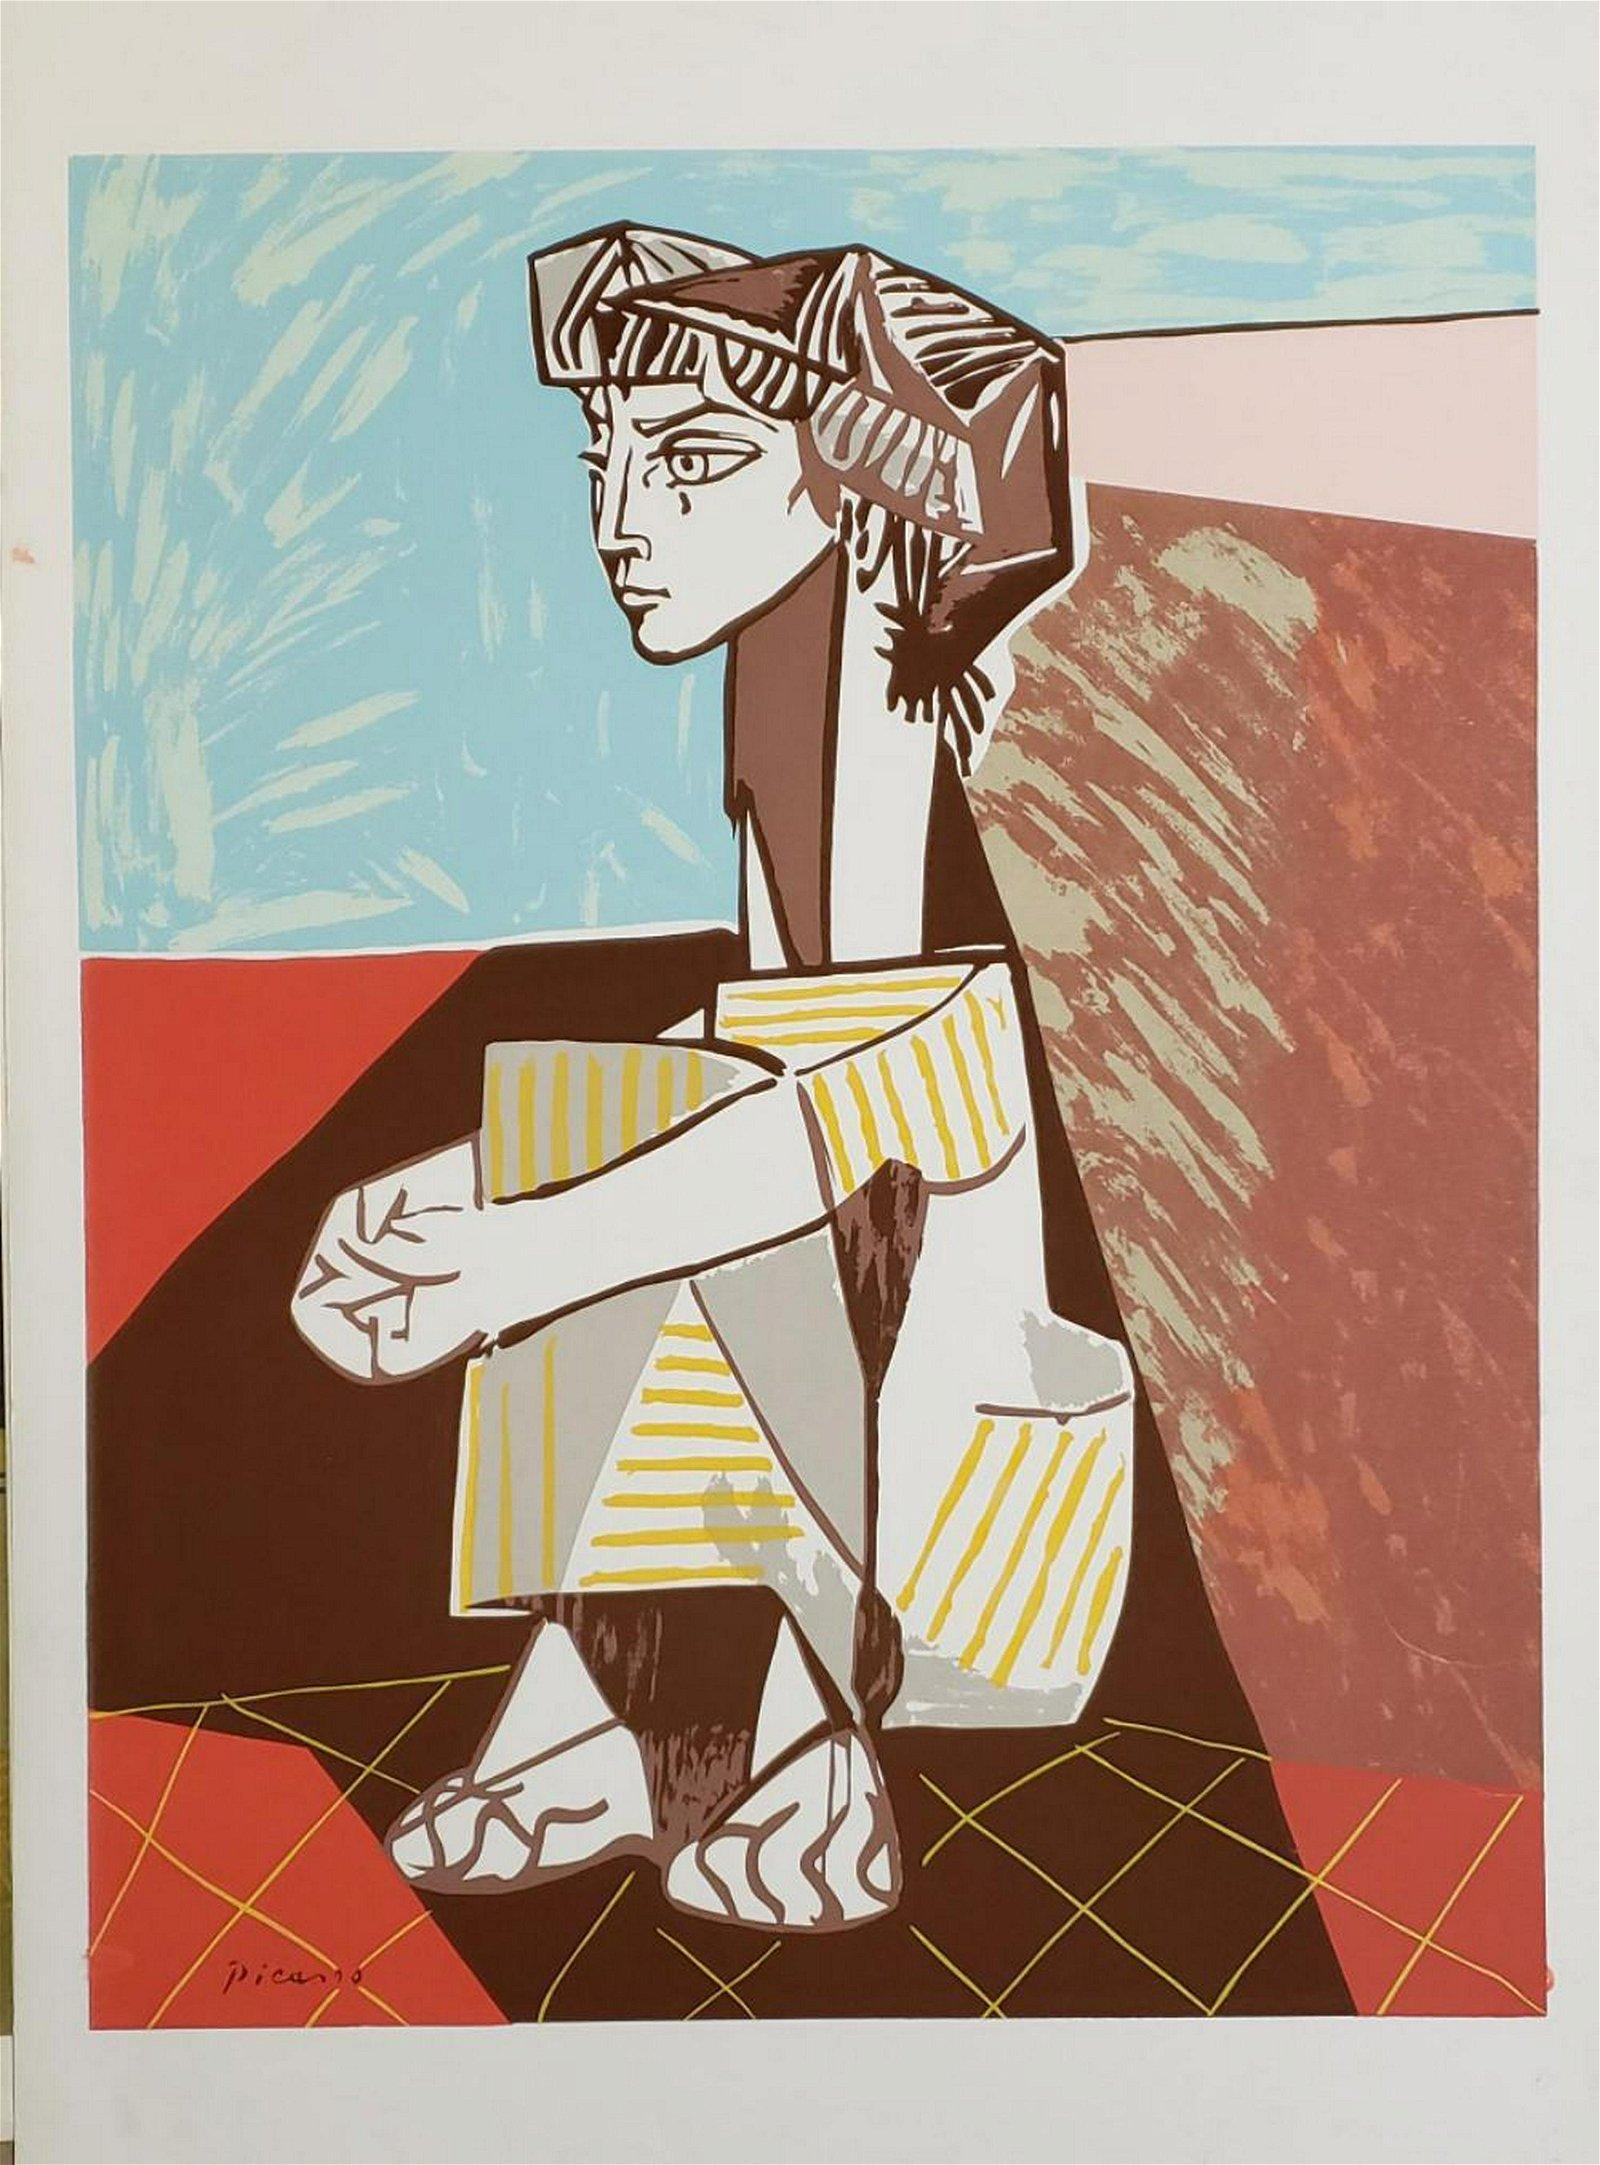 Pablo Picasso portrait of jacqueline roque with her